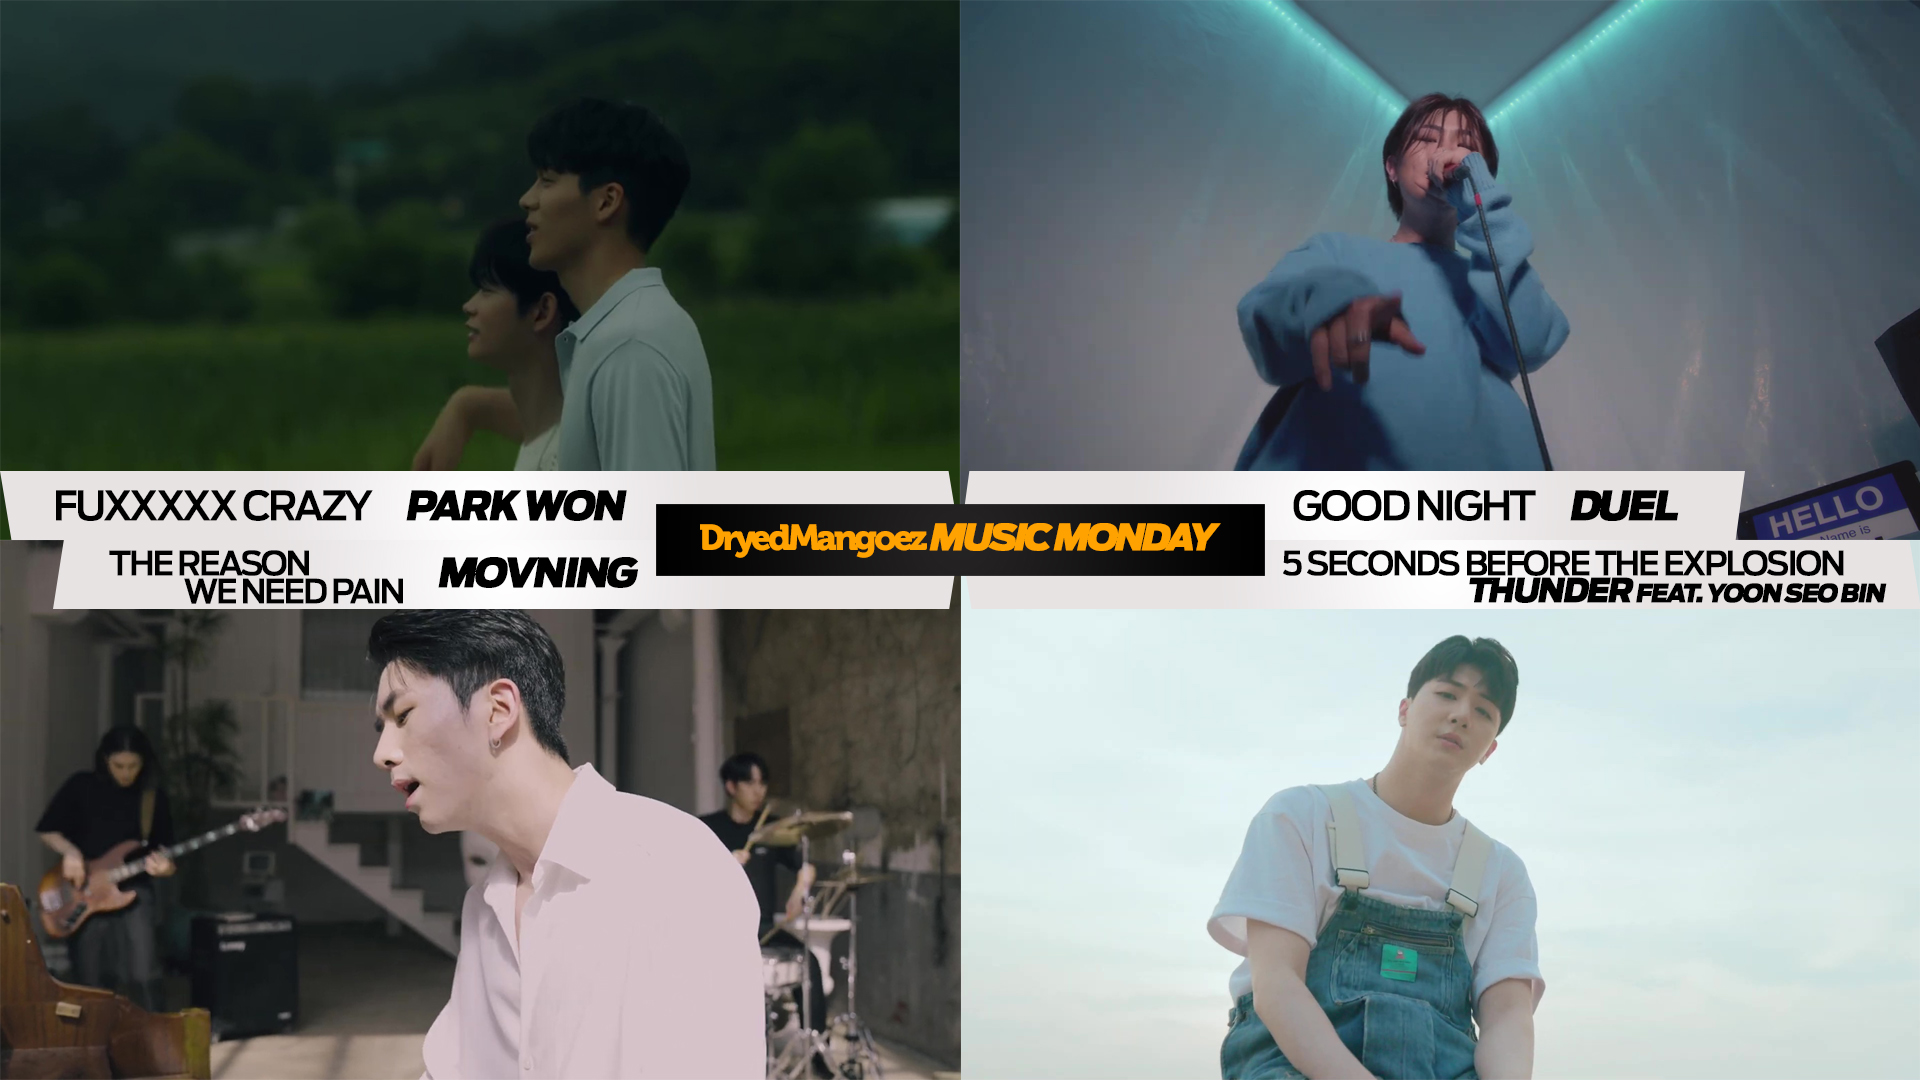 Music Monday, August 23, 2021 (Part 2) – Park Won, DUEL, MOVNING, Thunder feat. Yoon Seo Bin